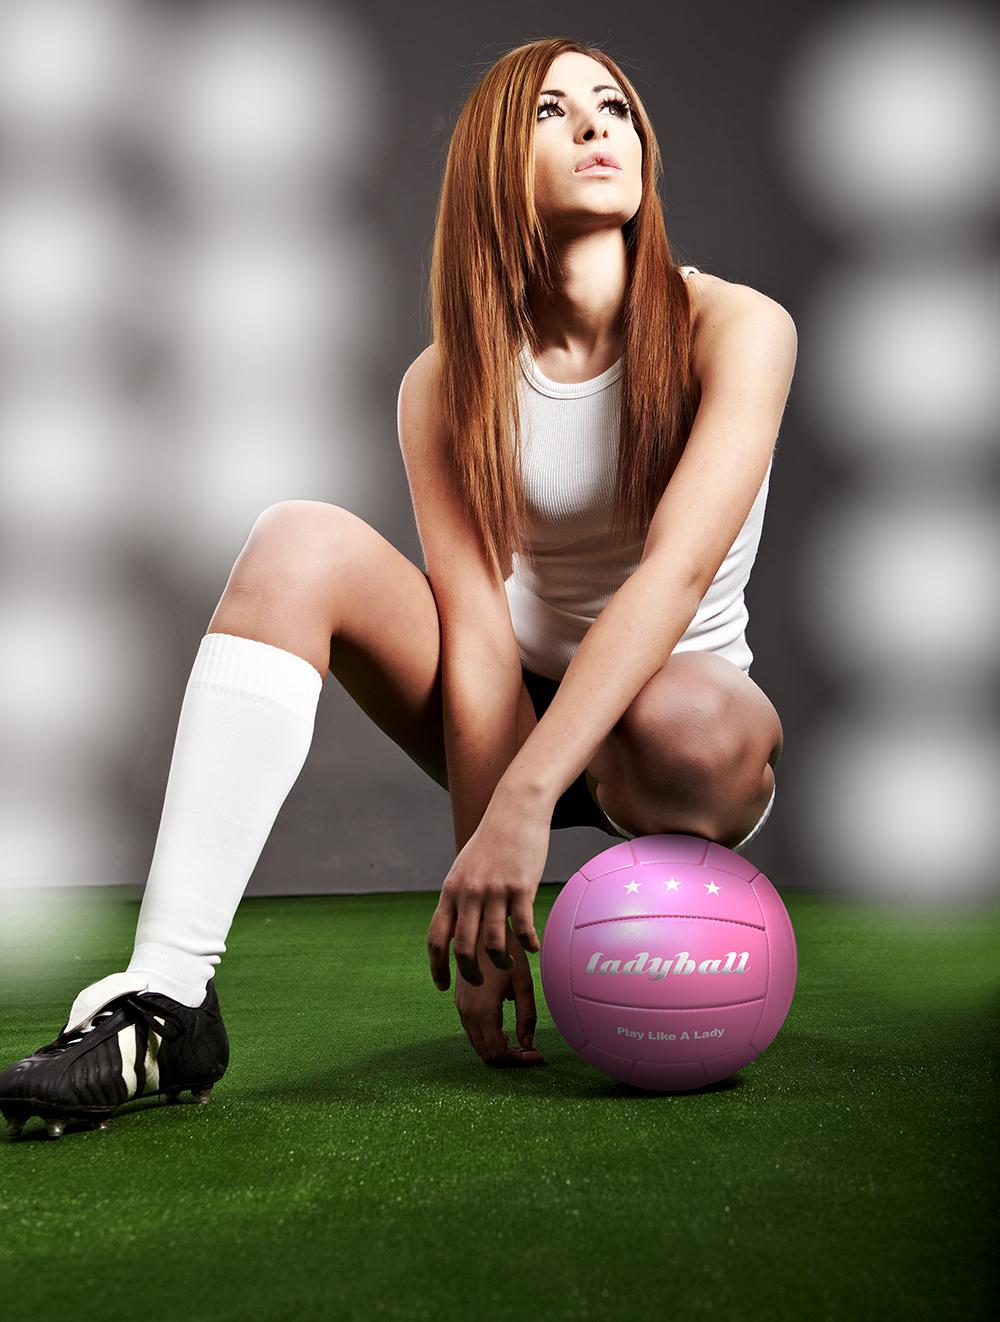 girlball